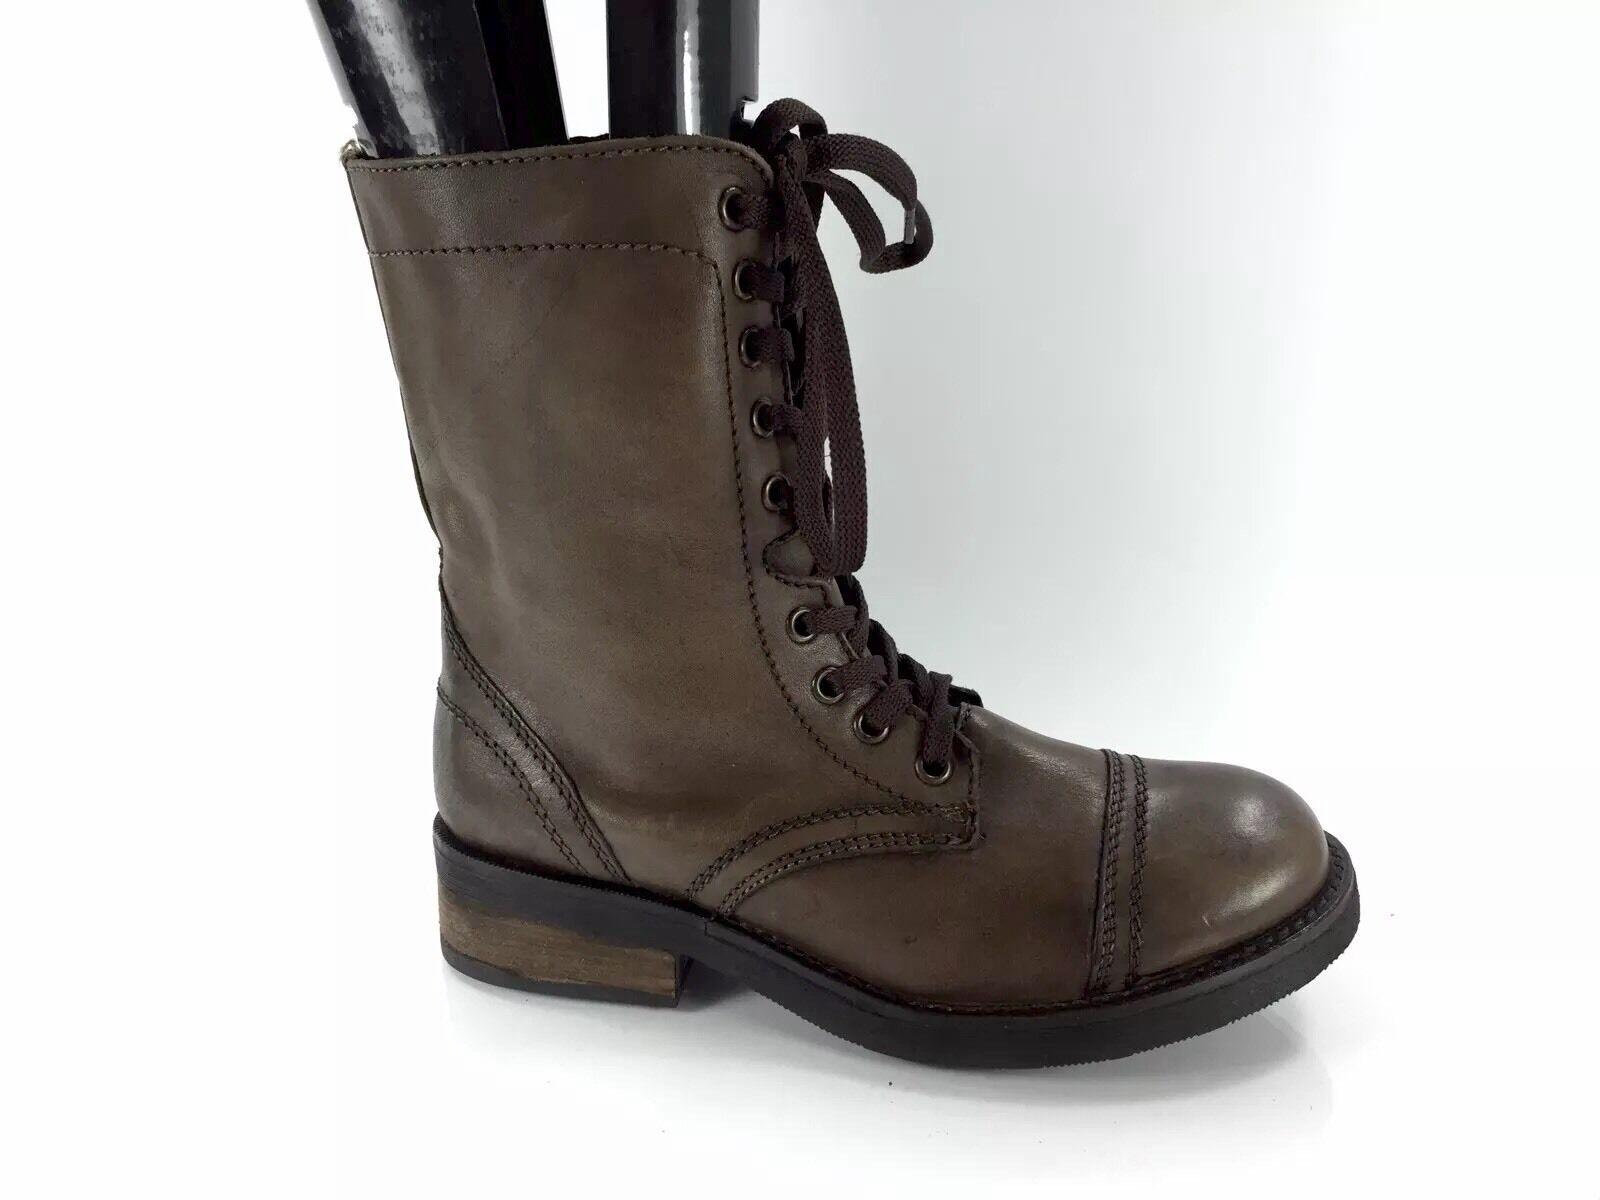 Zigi Soho Womens Brown Leather Boots 7.5 M